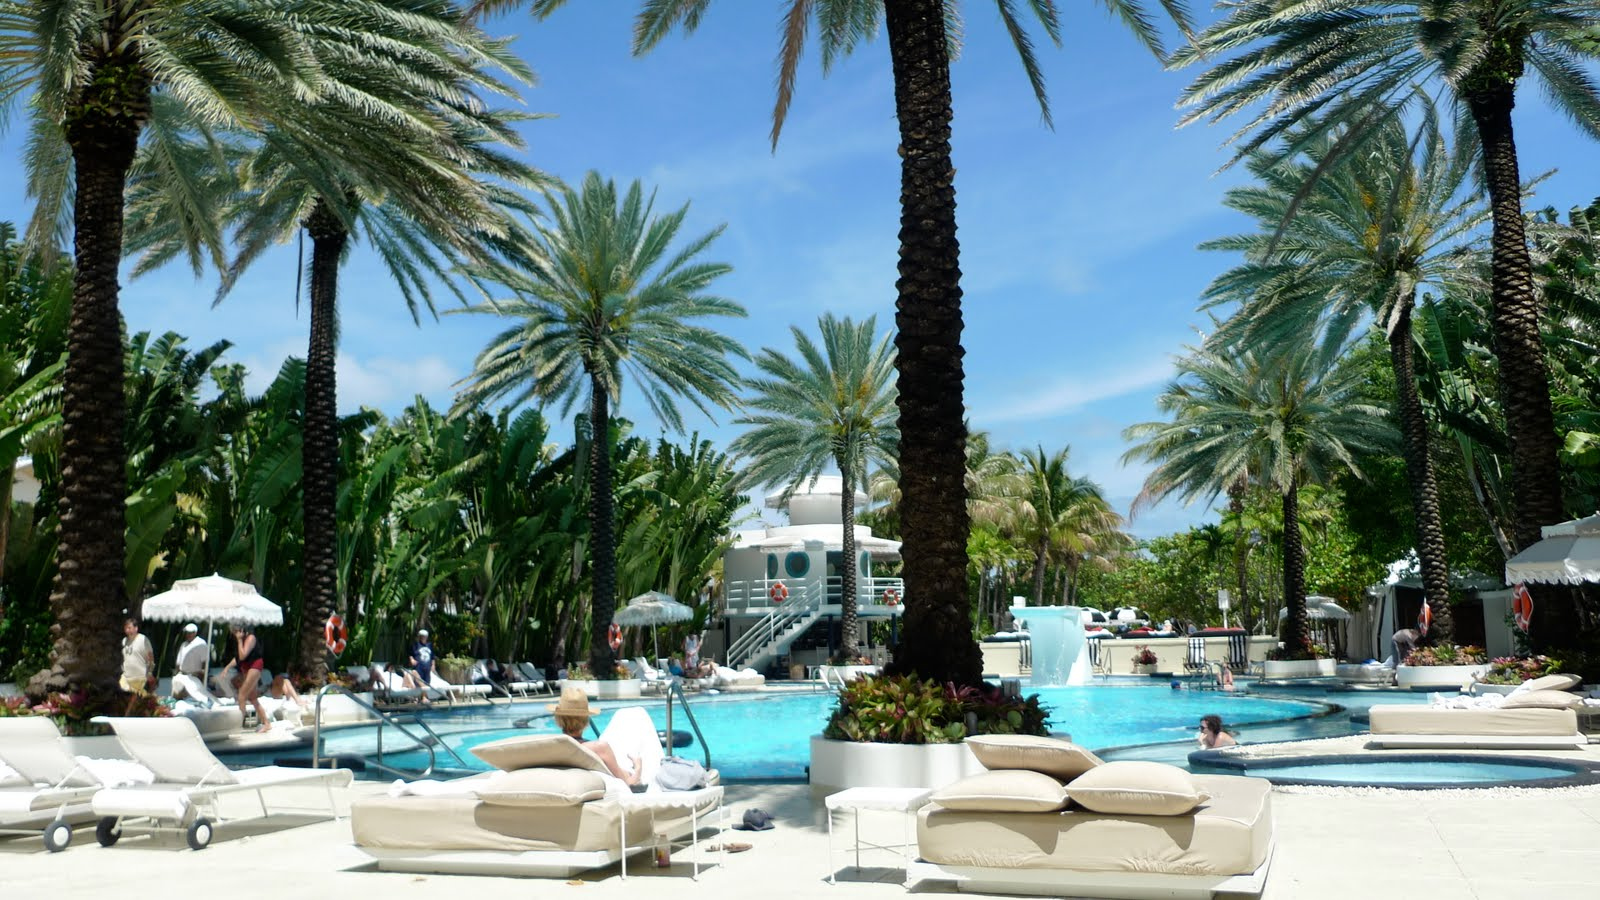 Raleigh Hotel In Miami Beach The Best Beaches World